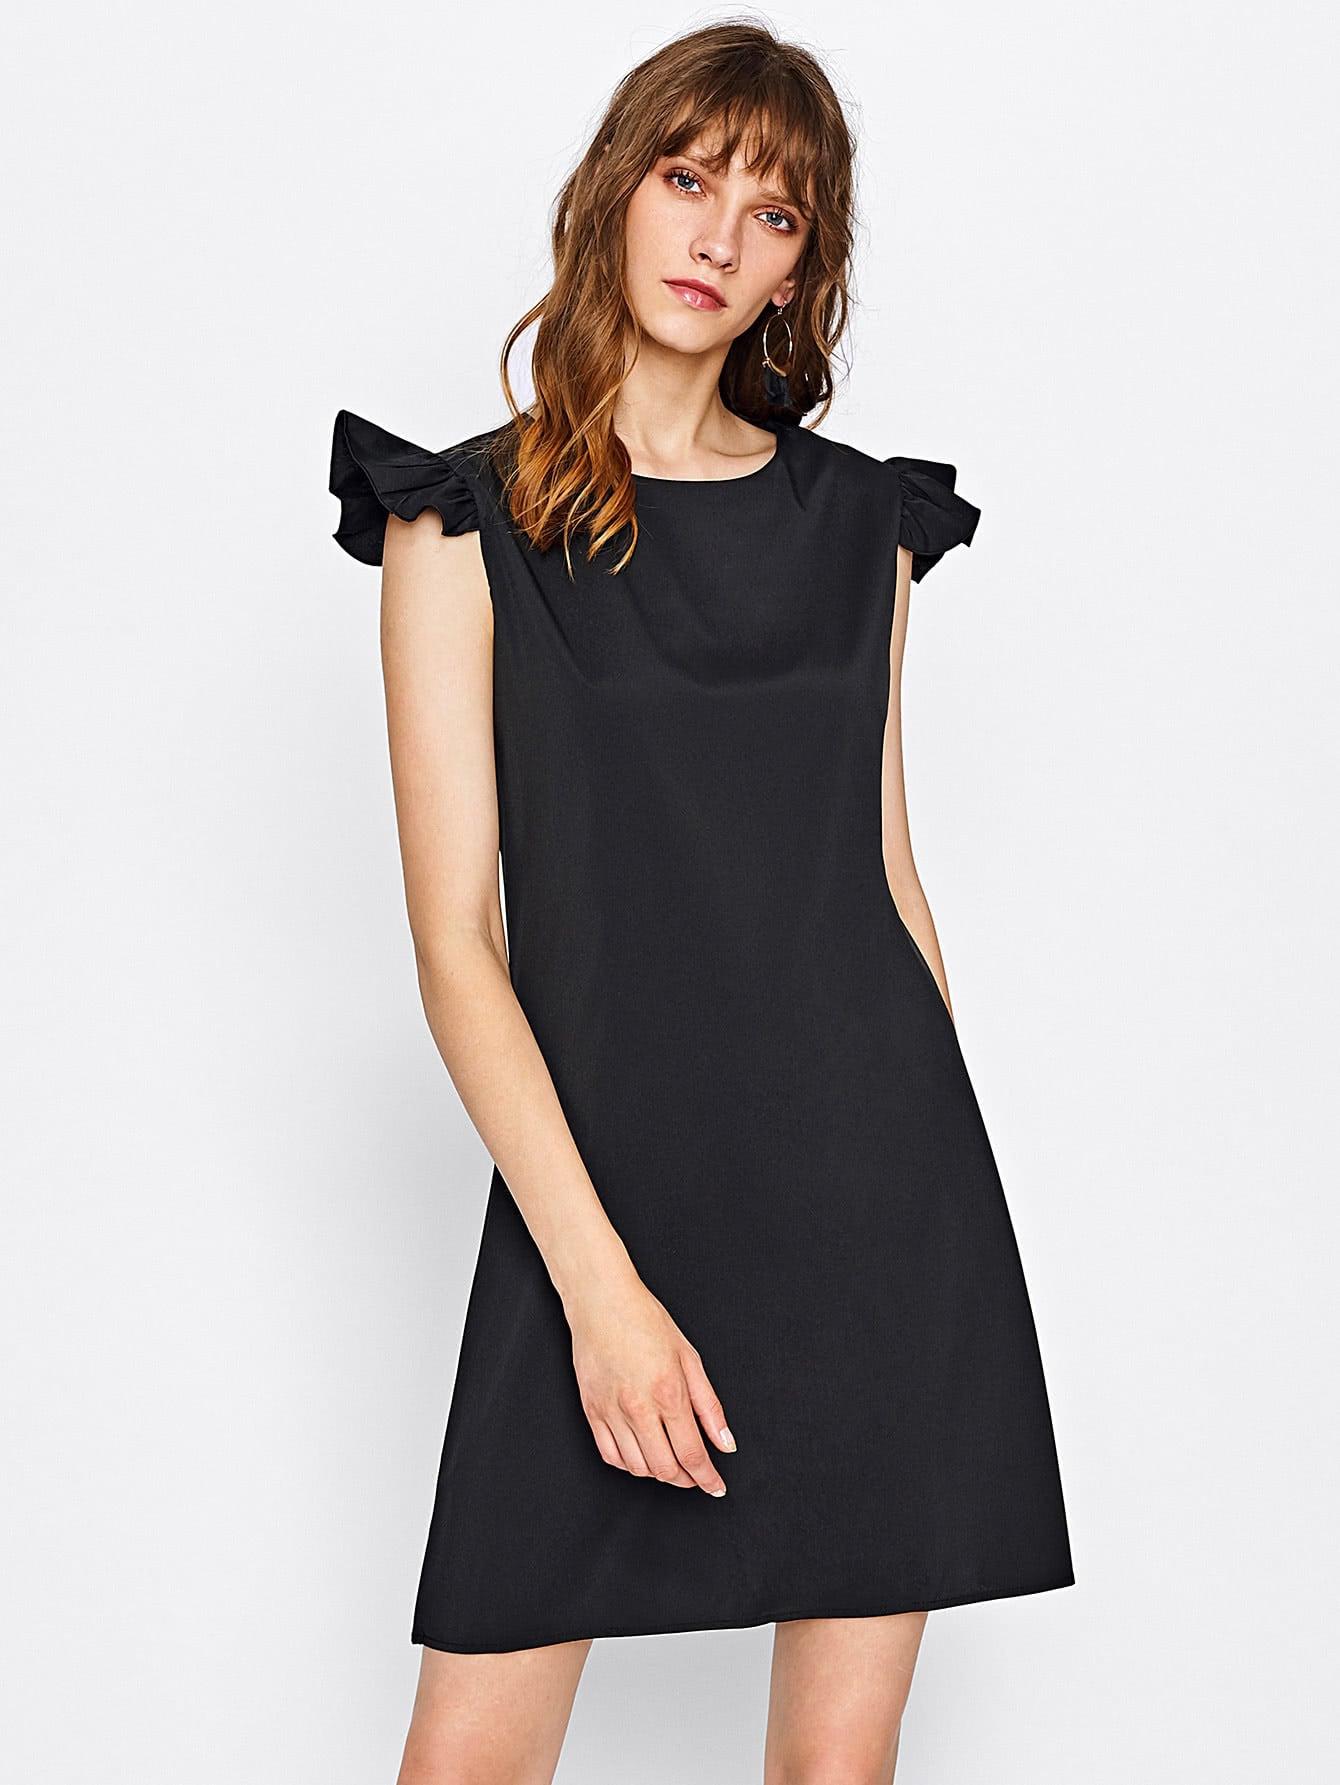 Frill Cap Sleeve Dress dress170803304